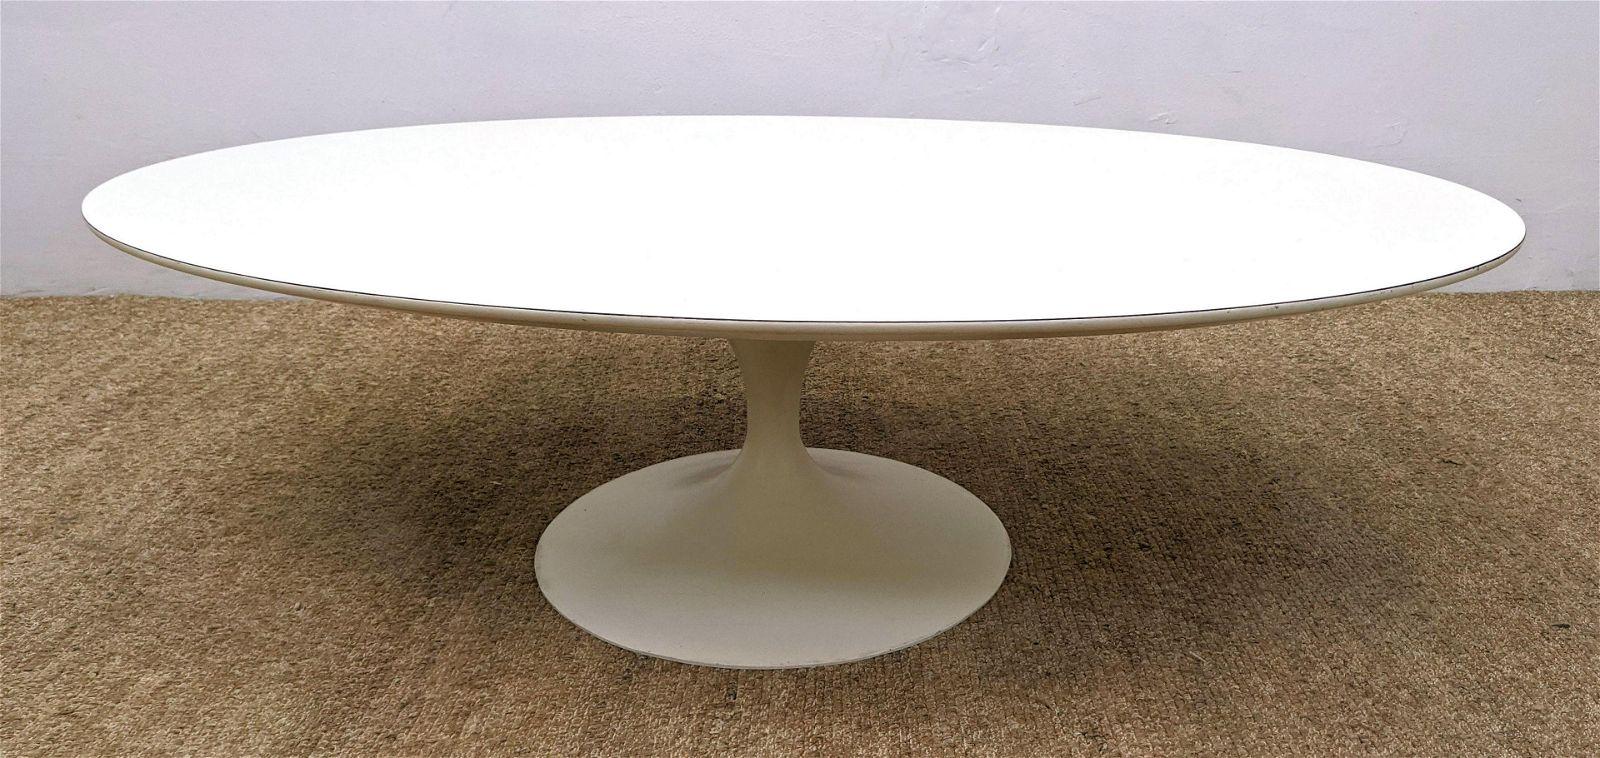 EERO SAARINEN for Knoll Coffee Cocktail Table. Oval lam